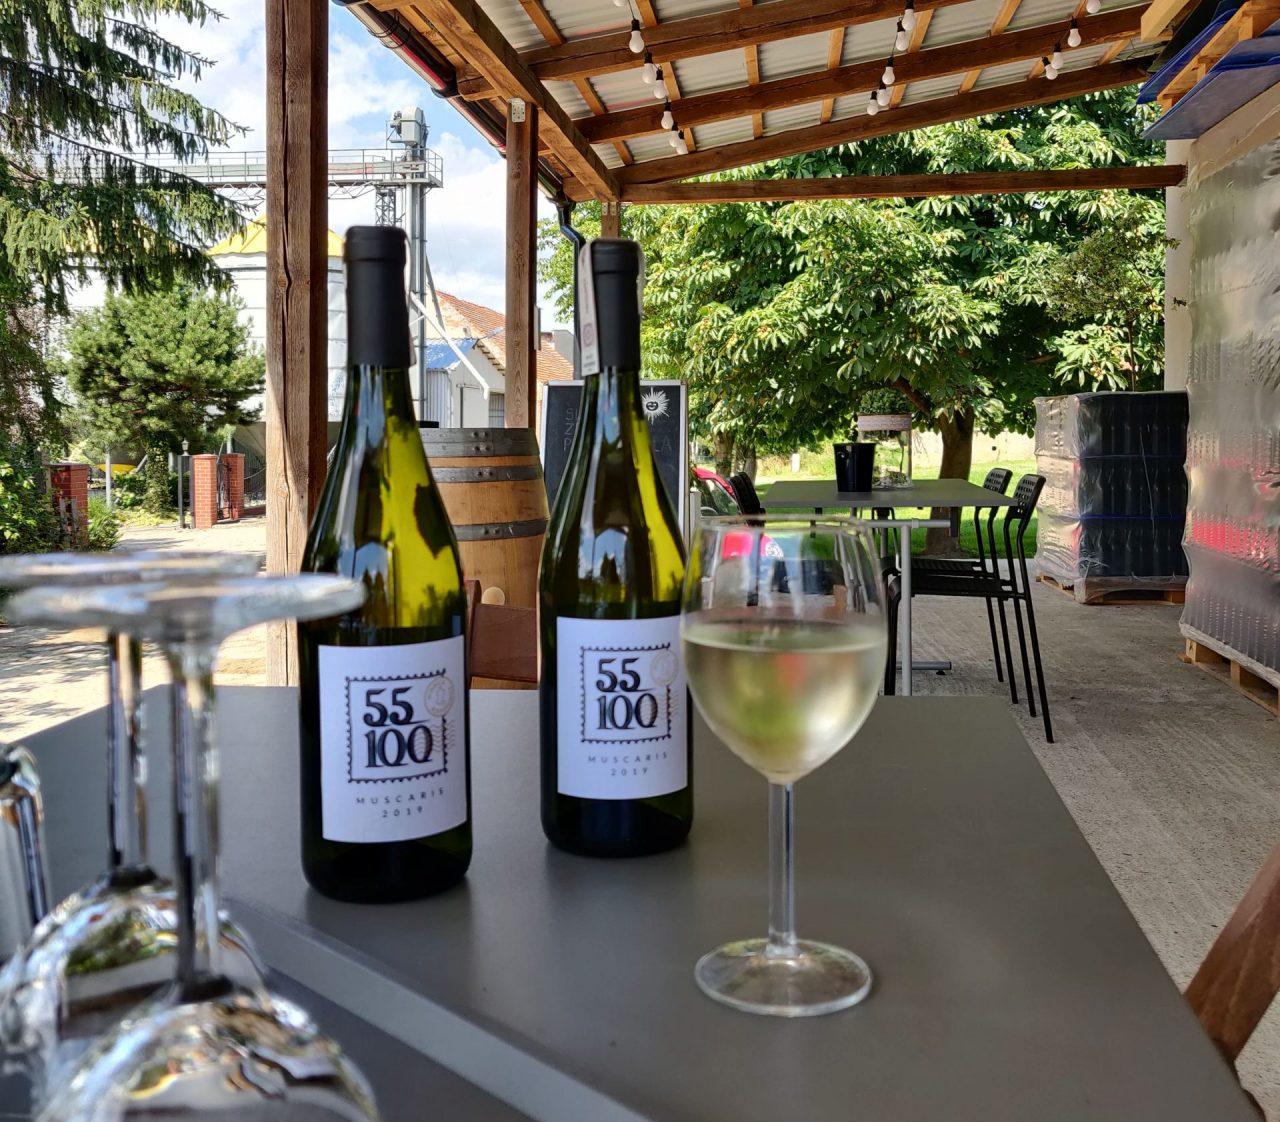 Wino białe, winnica 55:100